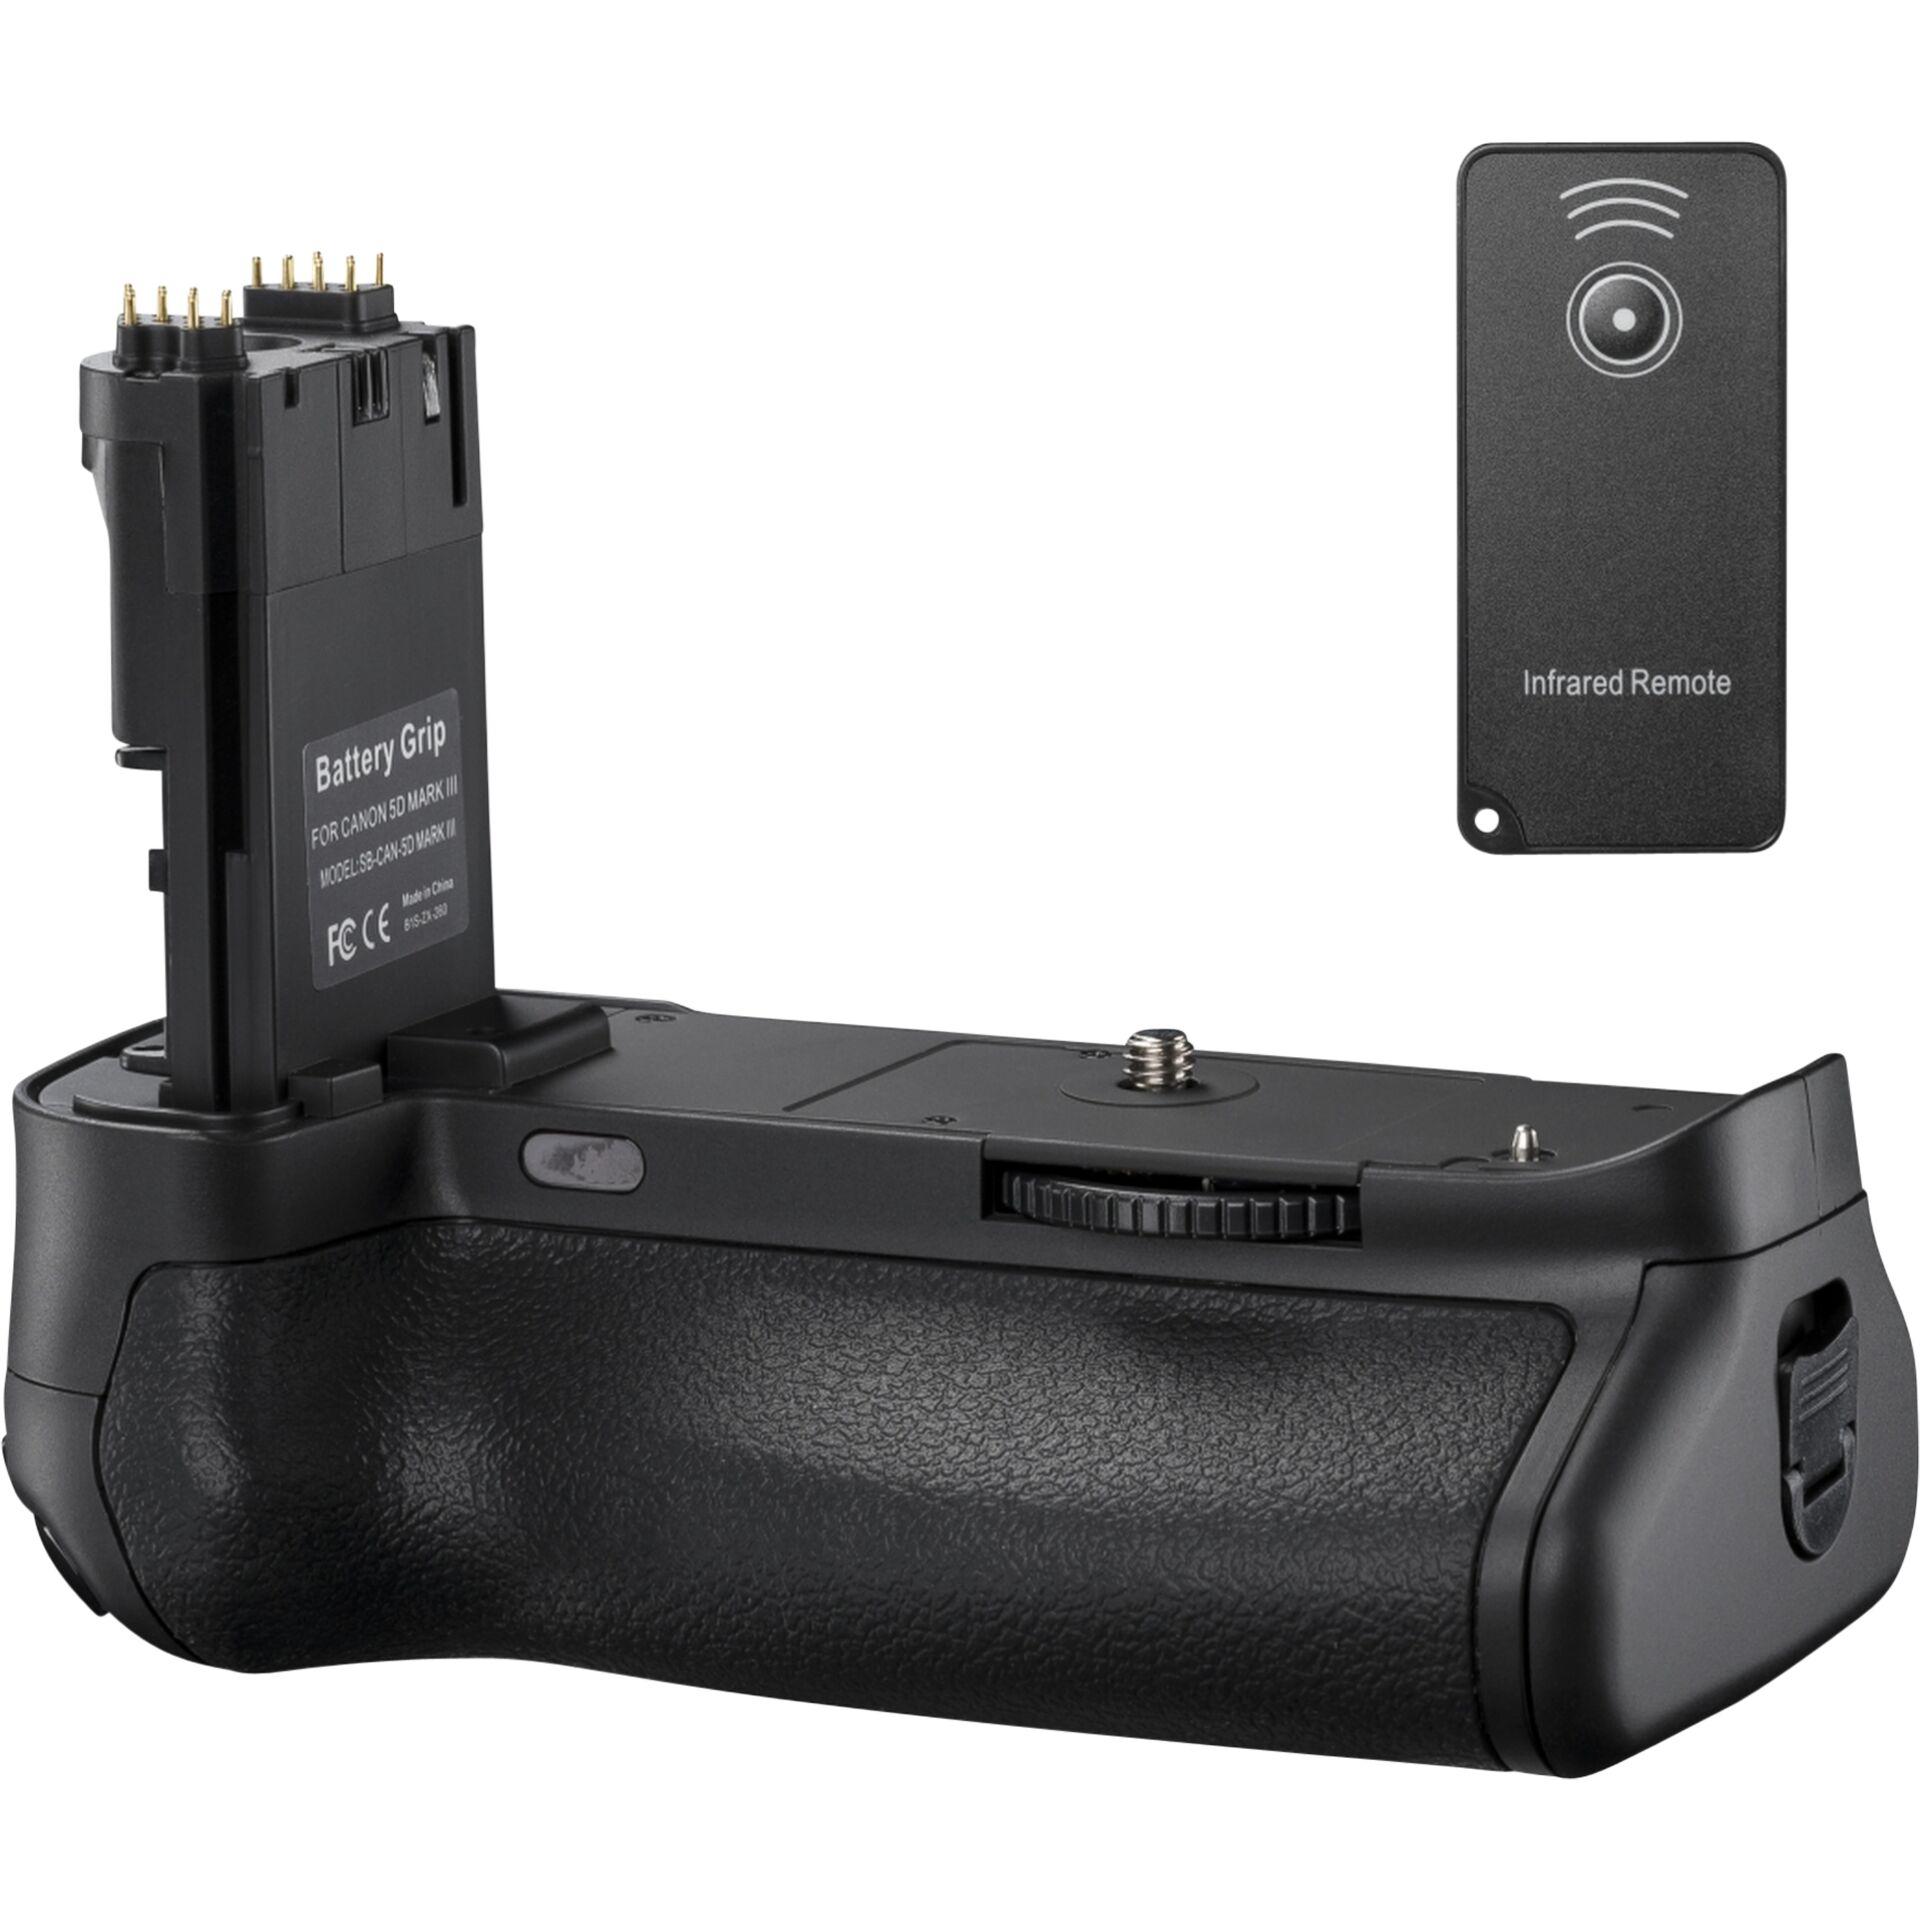 walimex pro Batteriehandgriff Canon 5D MK III/5D/5Ds R